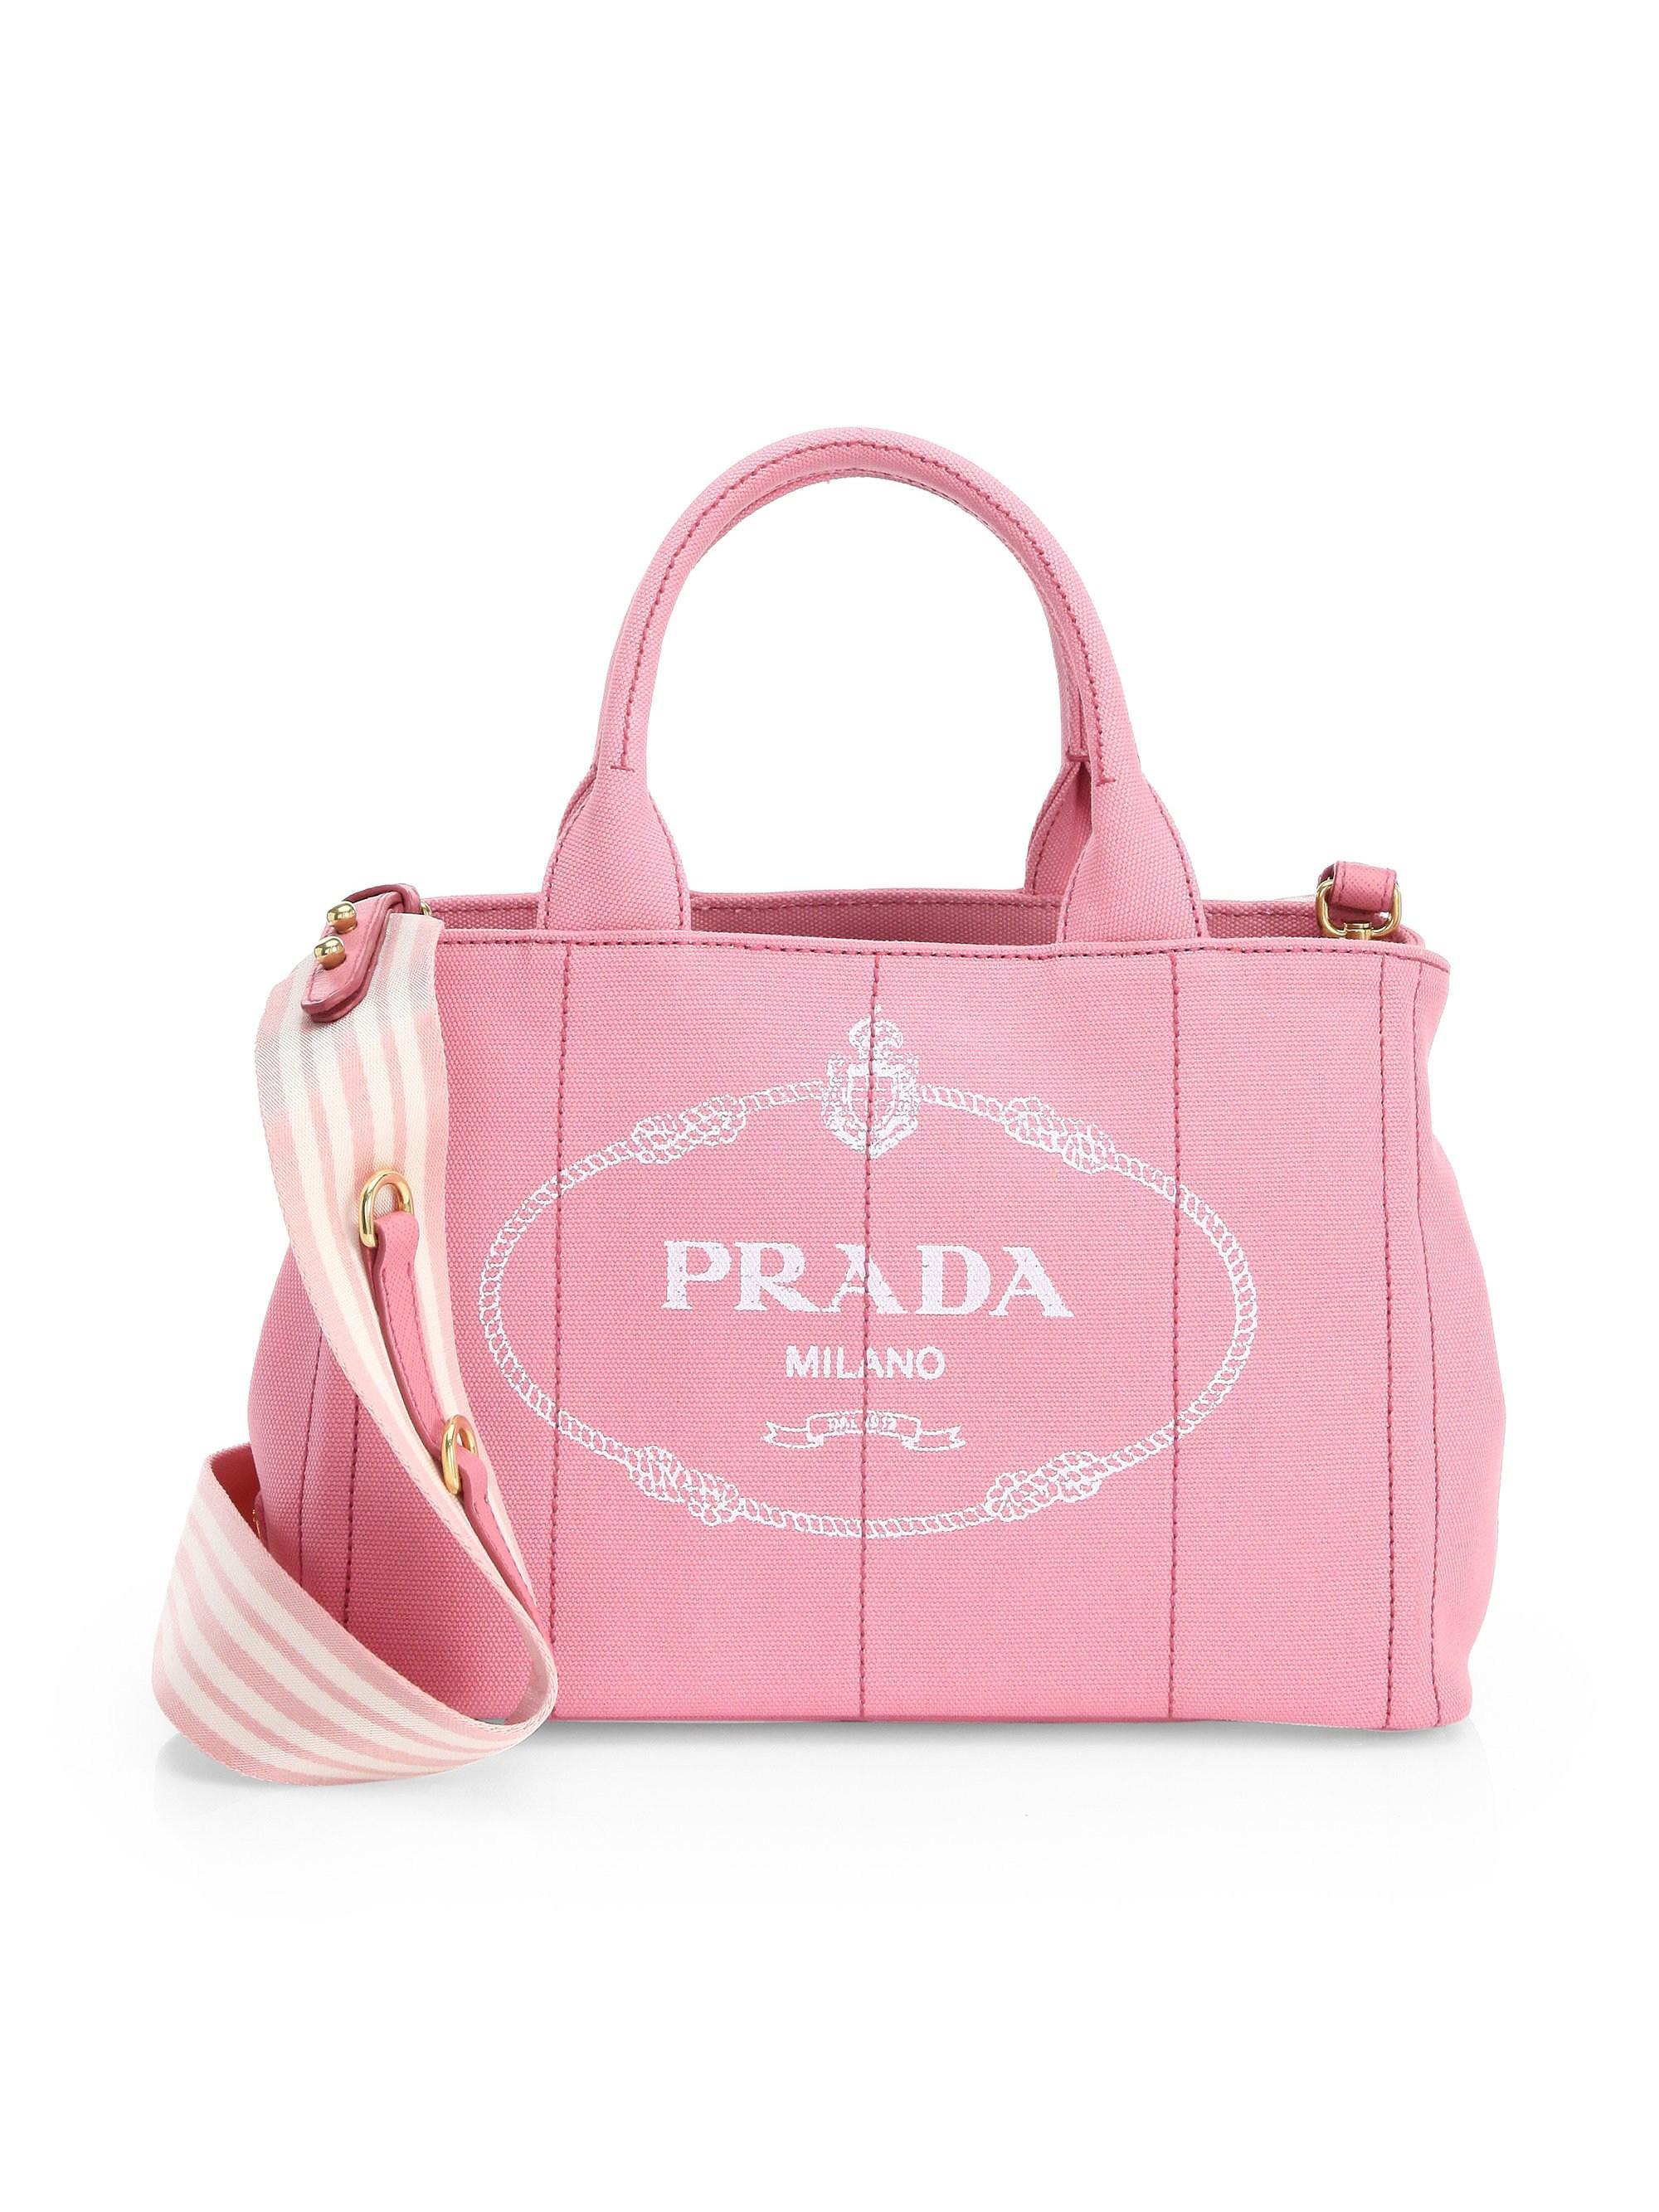 20e52727ed48 Prada Women's Small Canvas Shopper - Blue in Pink - Lyst